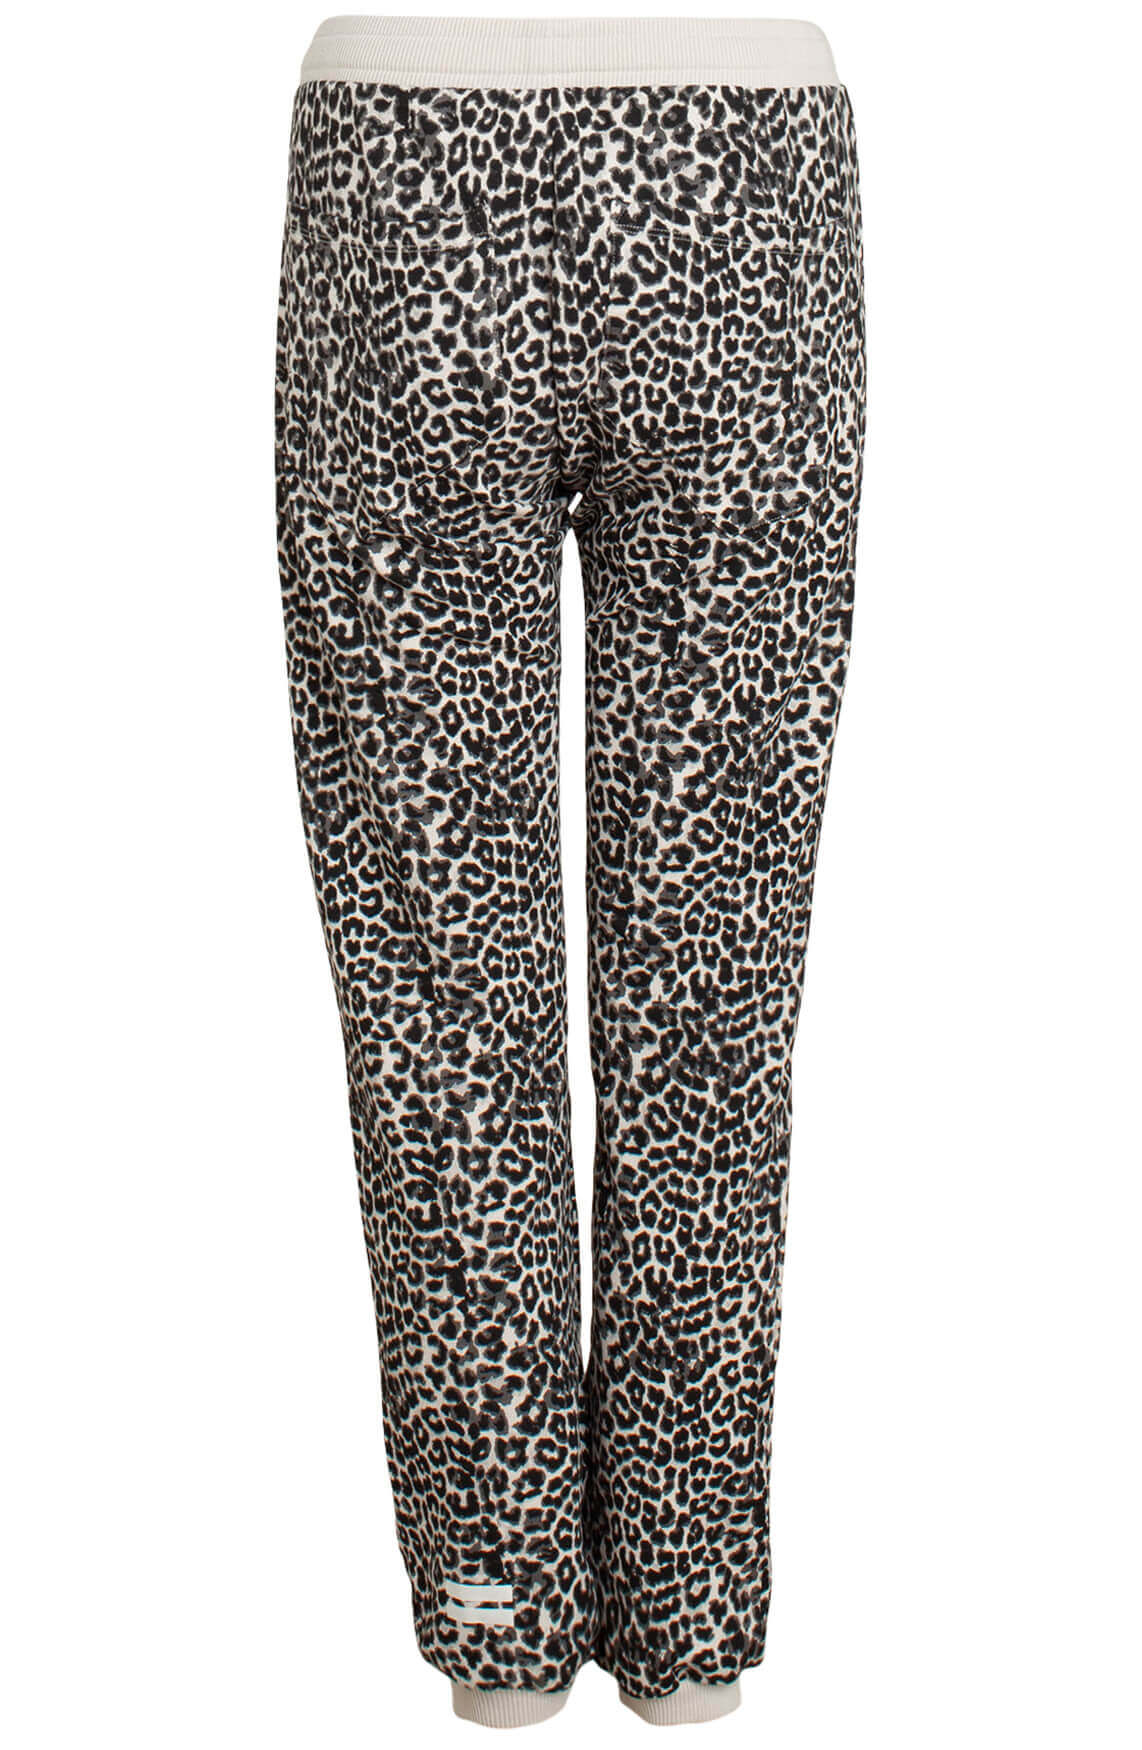 10 Days Dames Leopard jogger Grijs